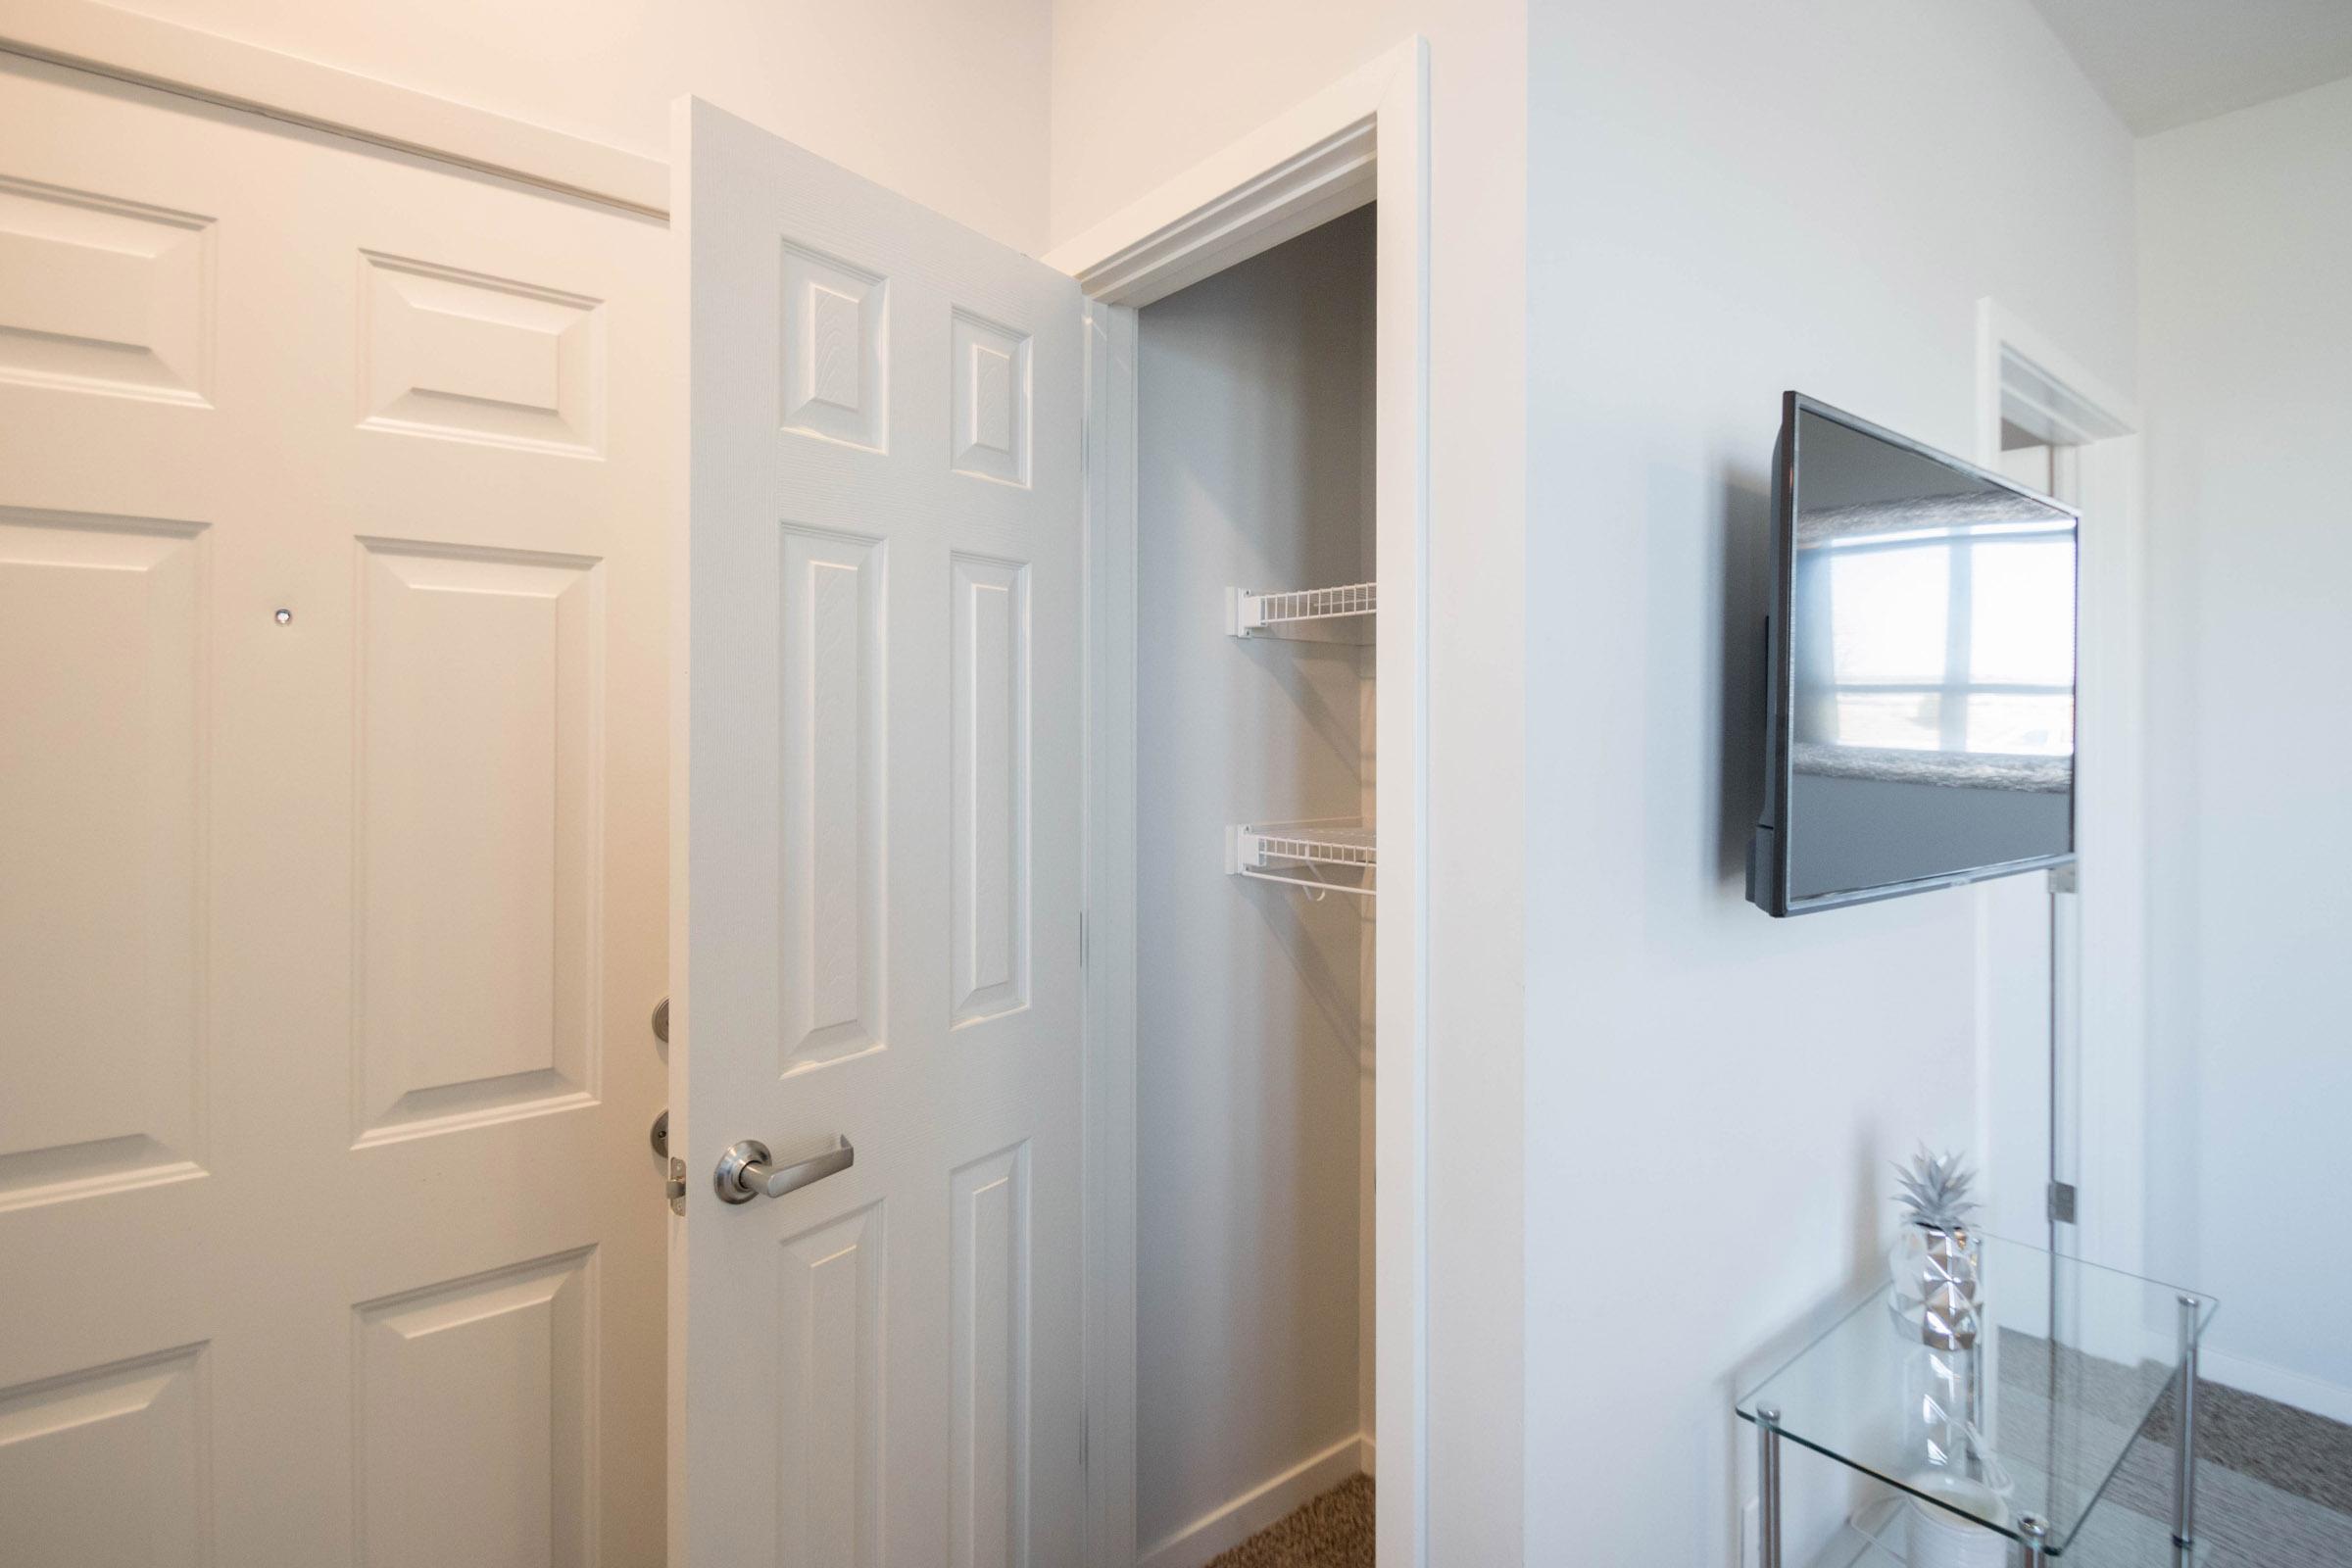 Entry Closet at Aspen Grove Apartments in Omaha, NE